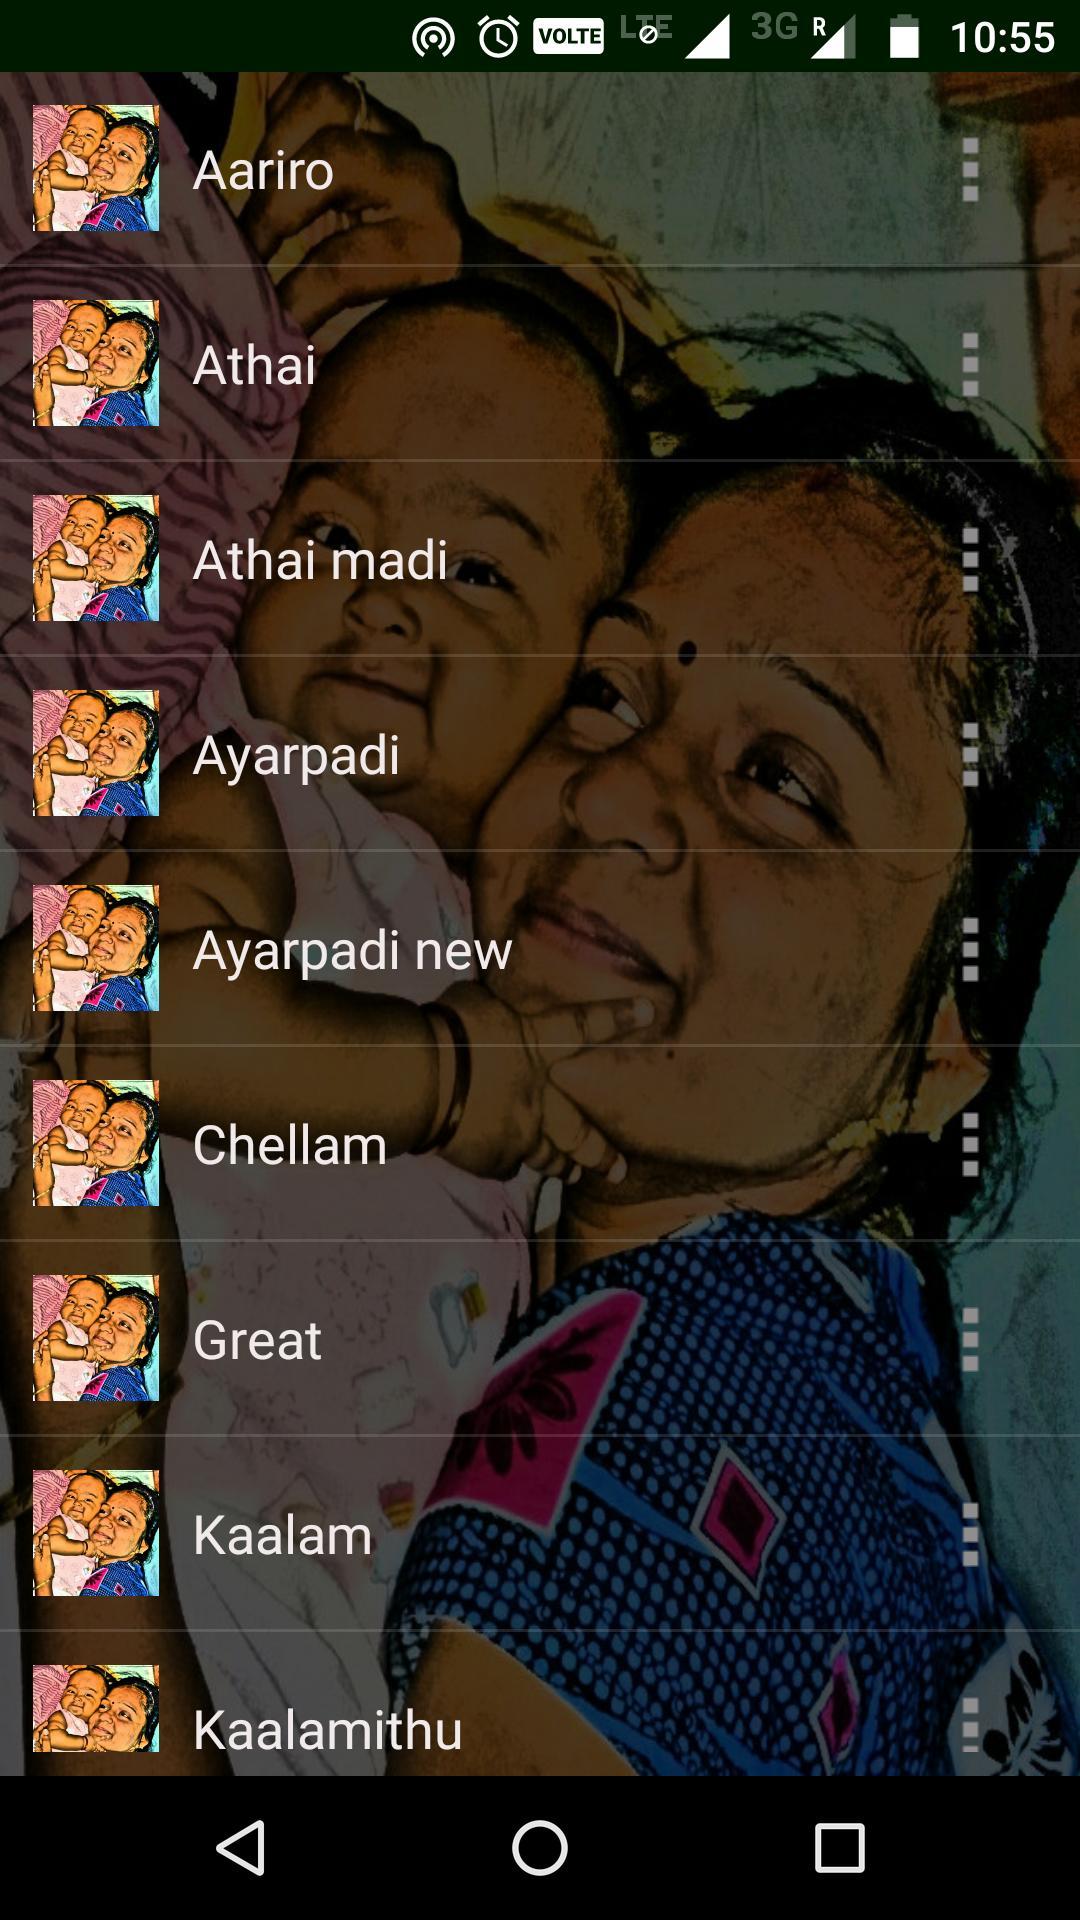 Amman koil song download veera thalattu song online only on jiosaavn.